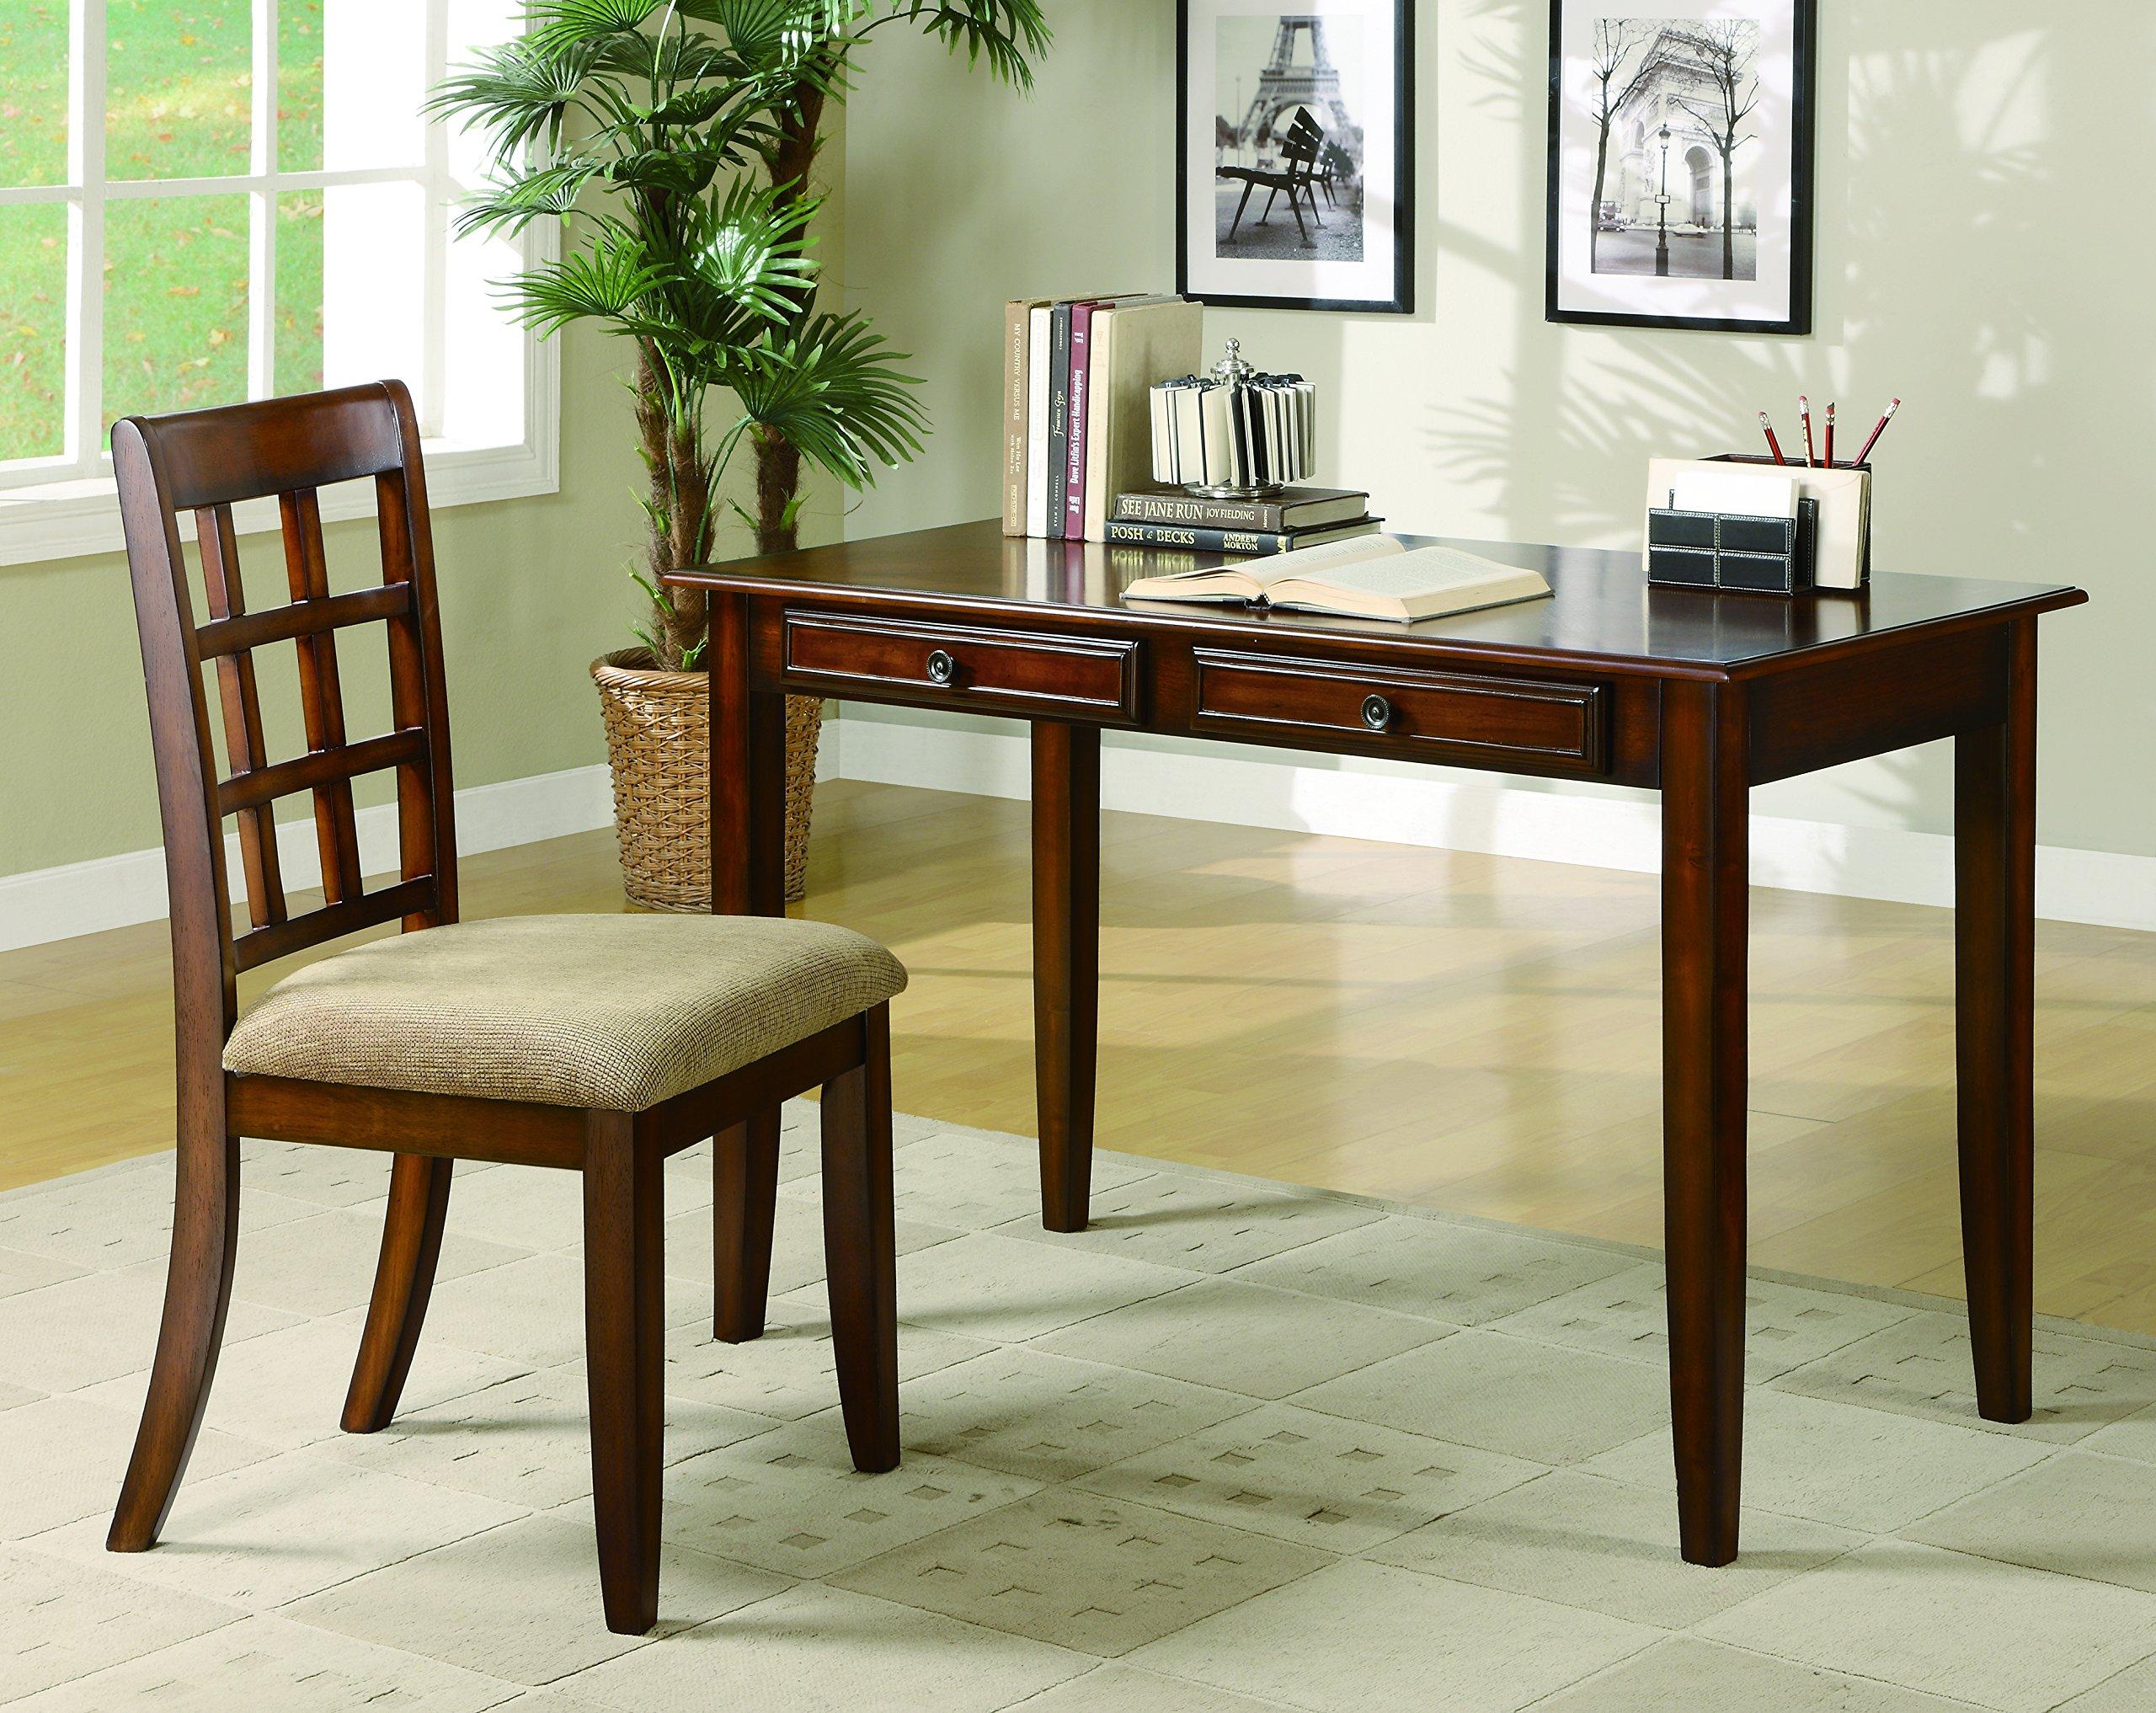 Coaster Home Furnishings Casual Desk Set, Brown by Coaster Home Furnishings